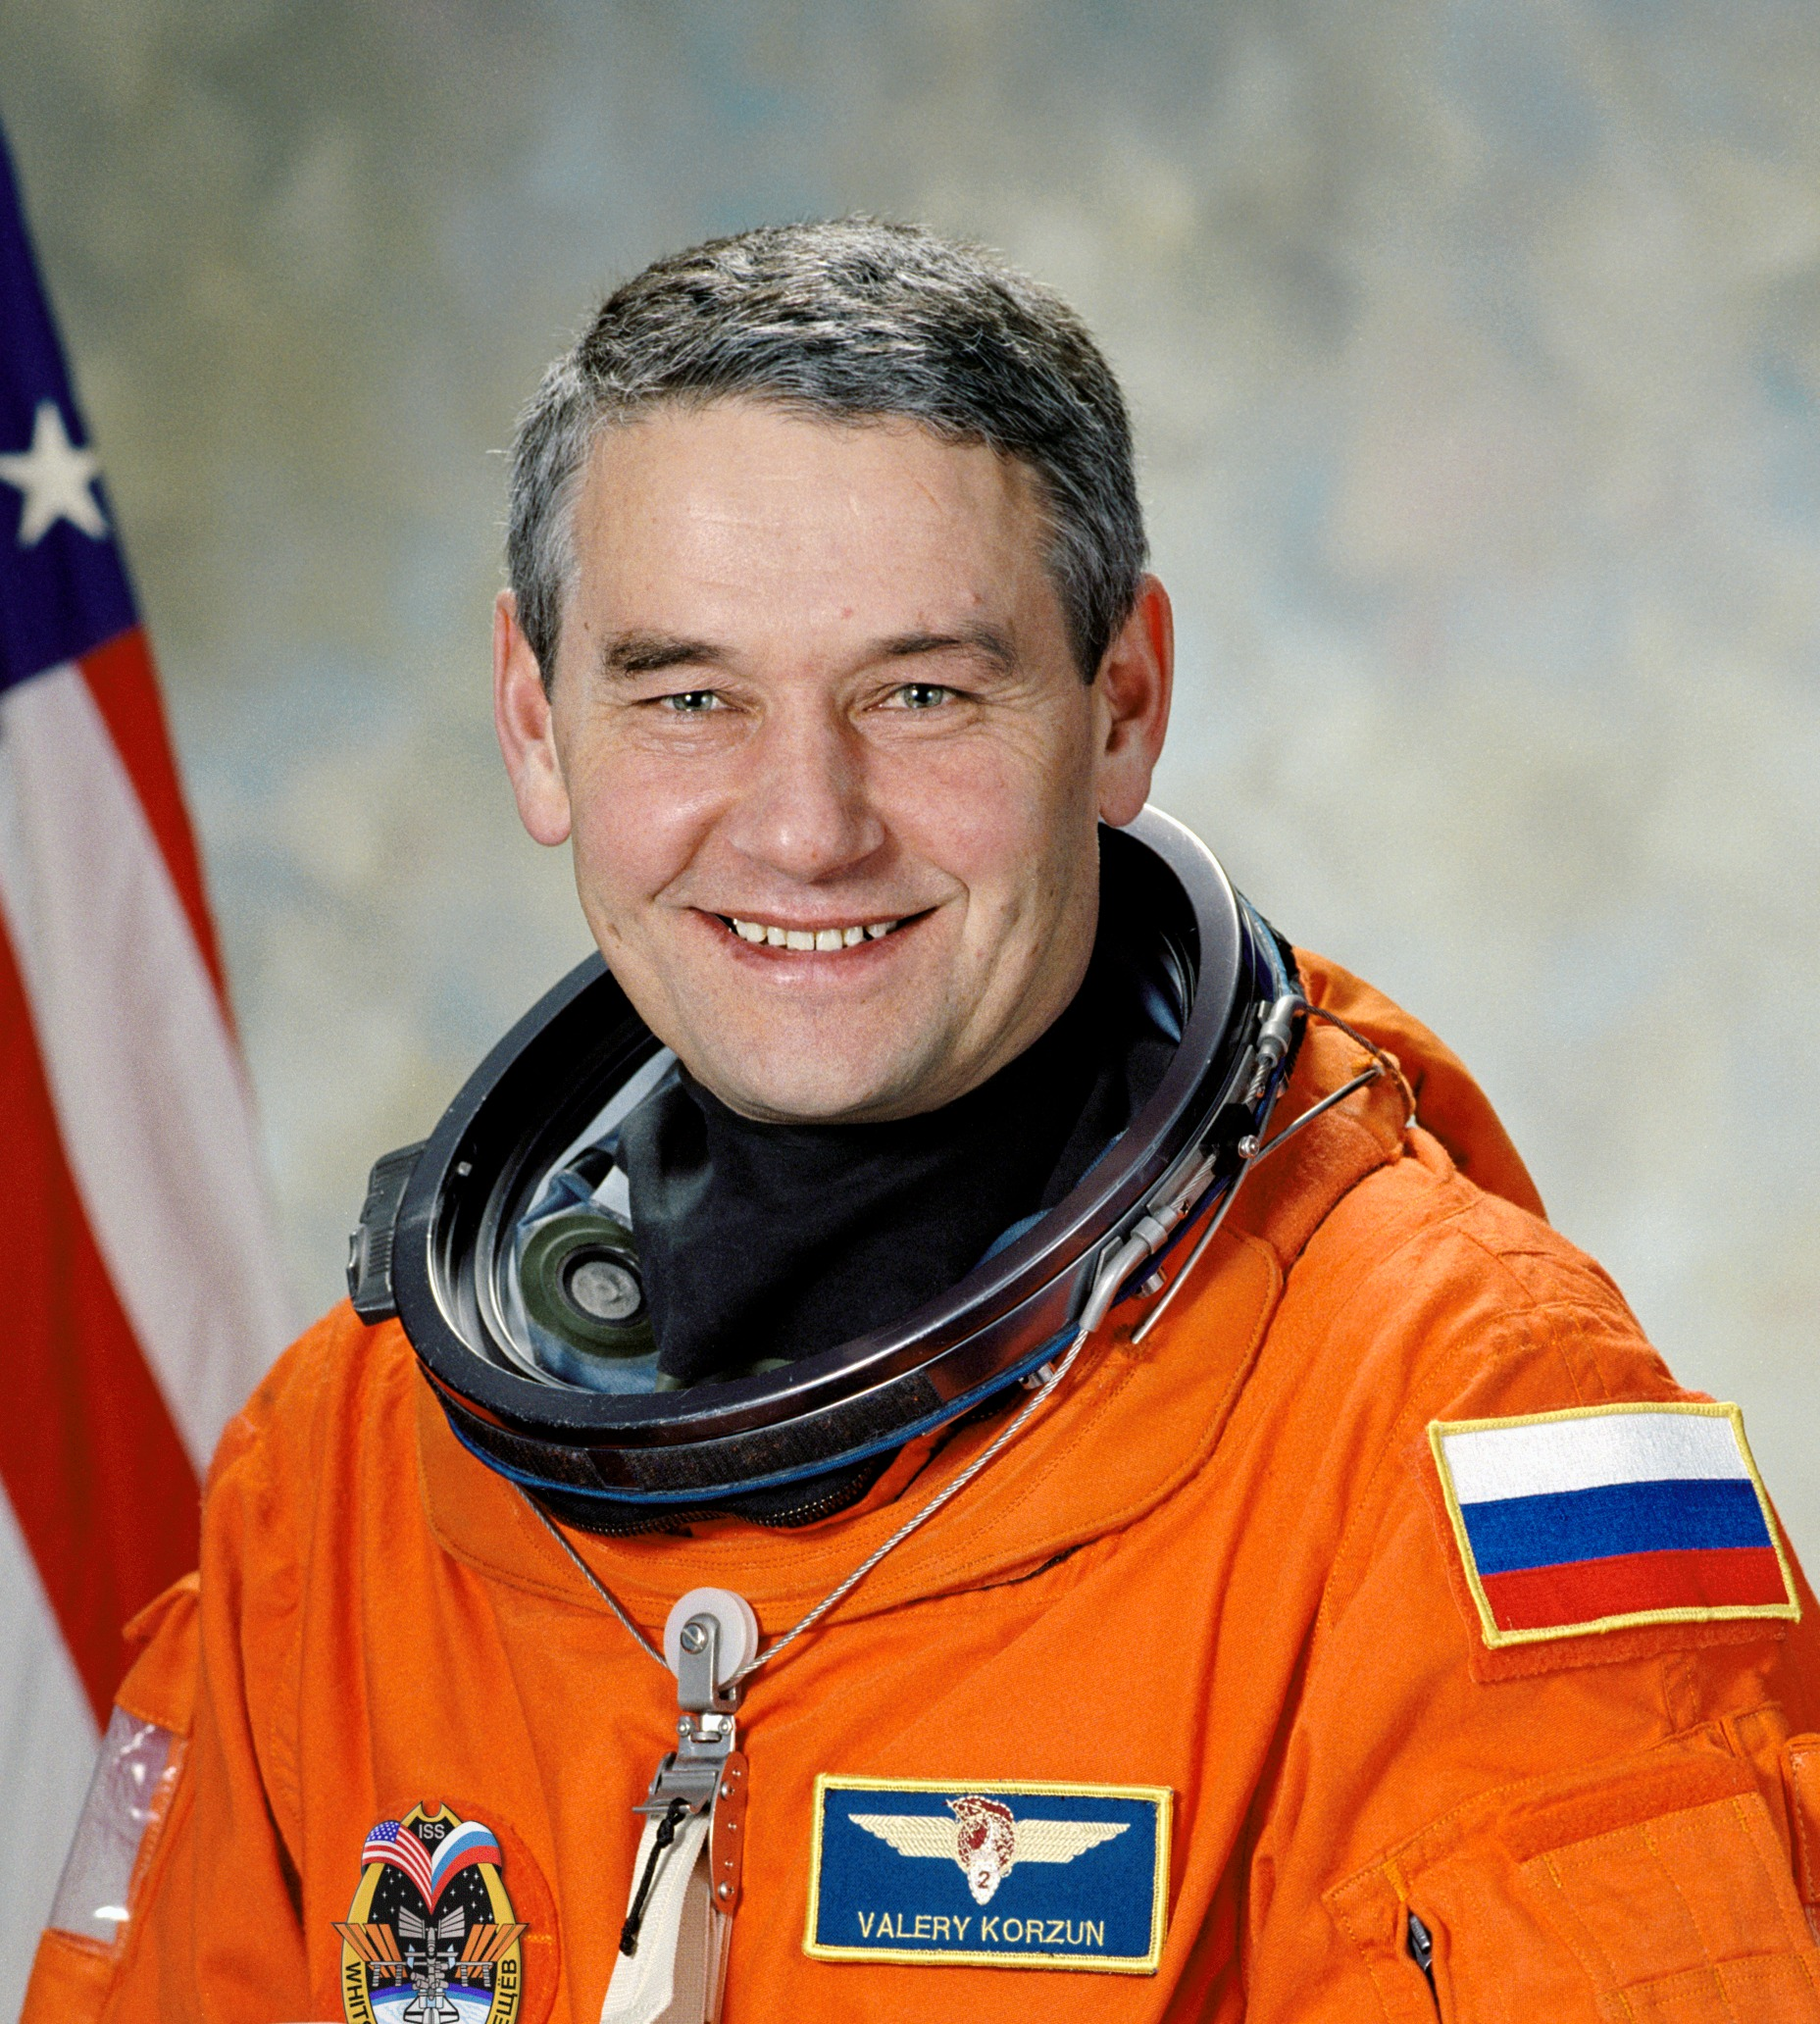 Valery Korzun - Wikipedia